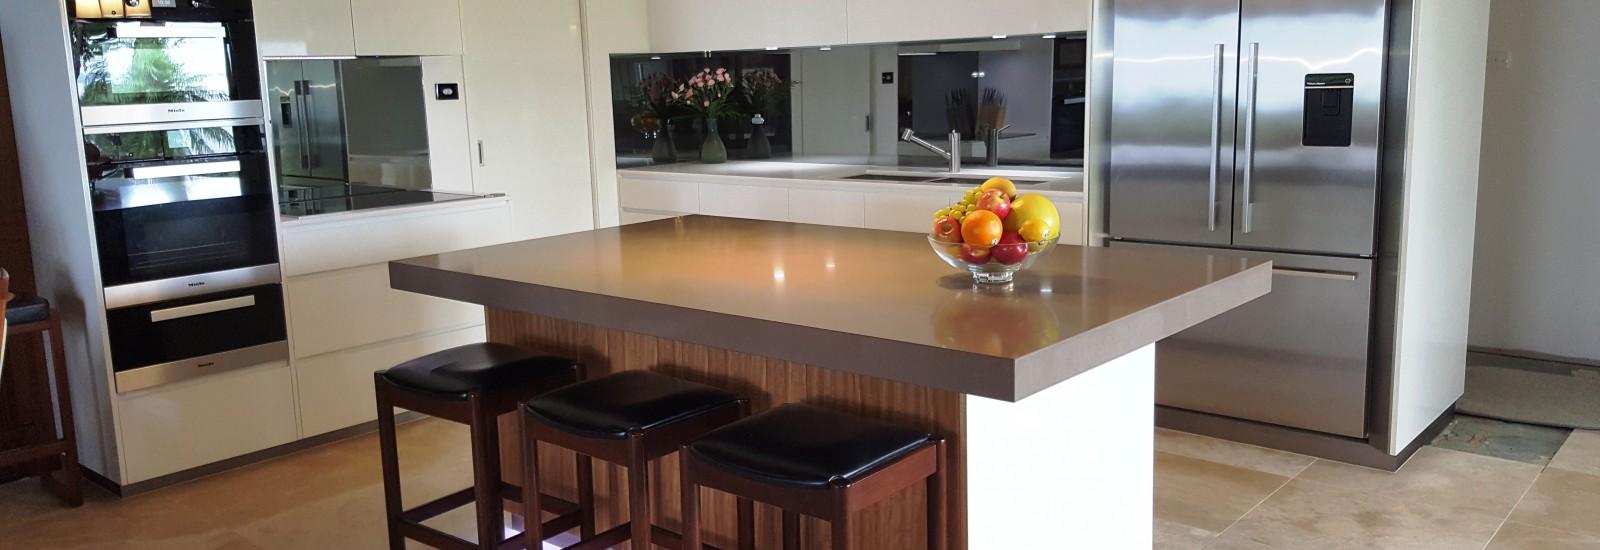 Advanced Kitchens - Batemans Bay Kitchens